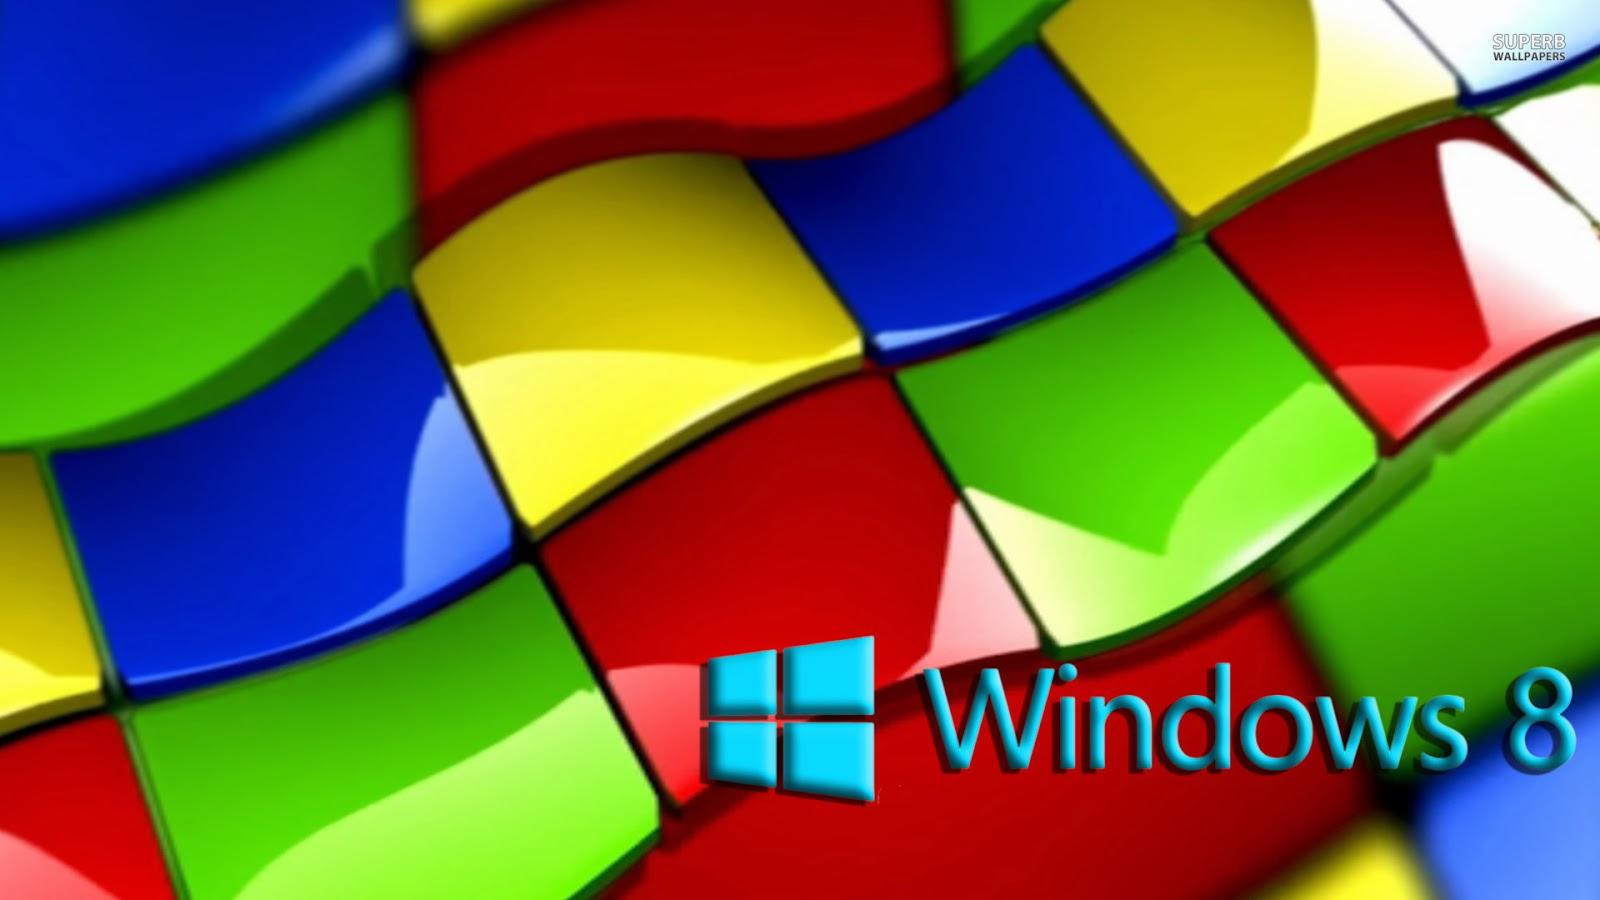 Windows 8 HD Wallpapers - HD Wallpapers Blog